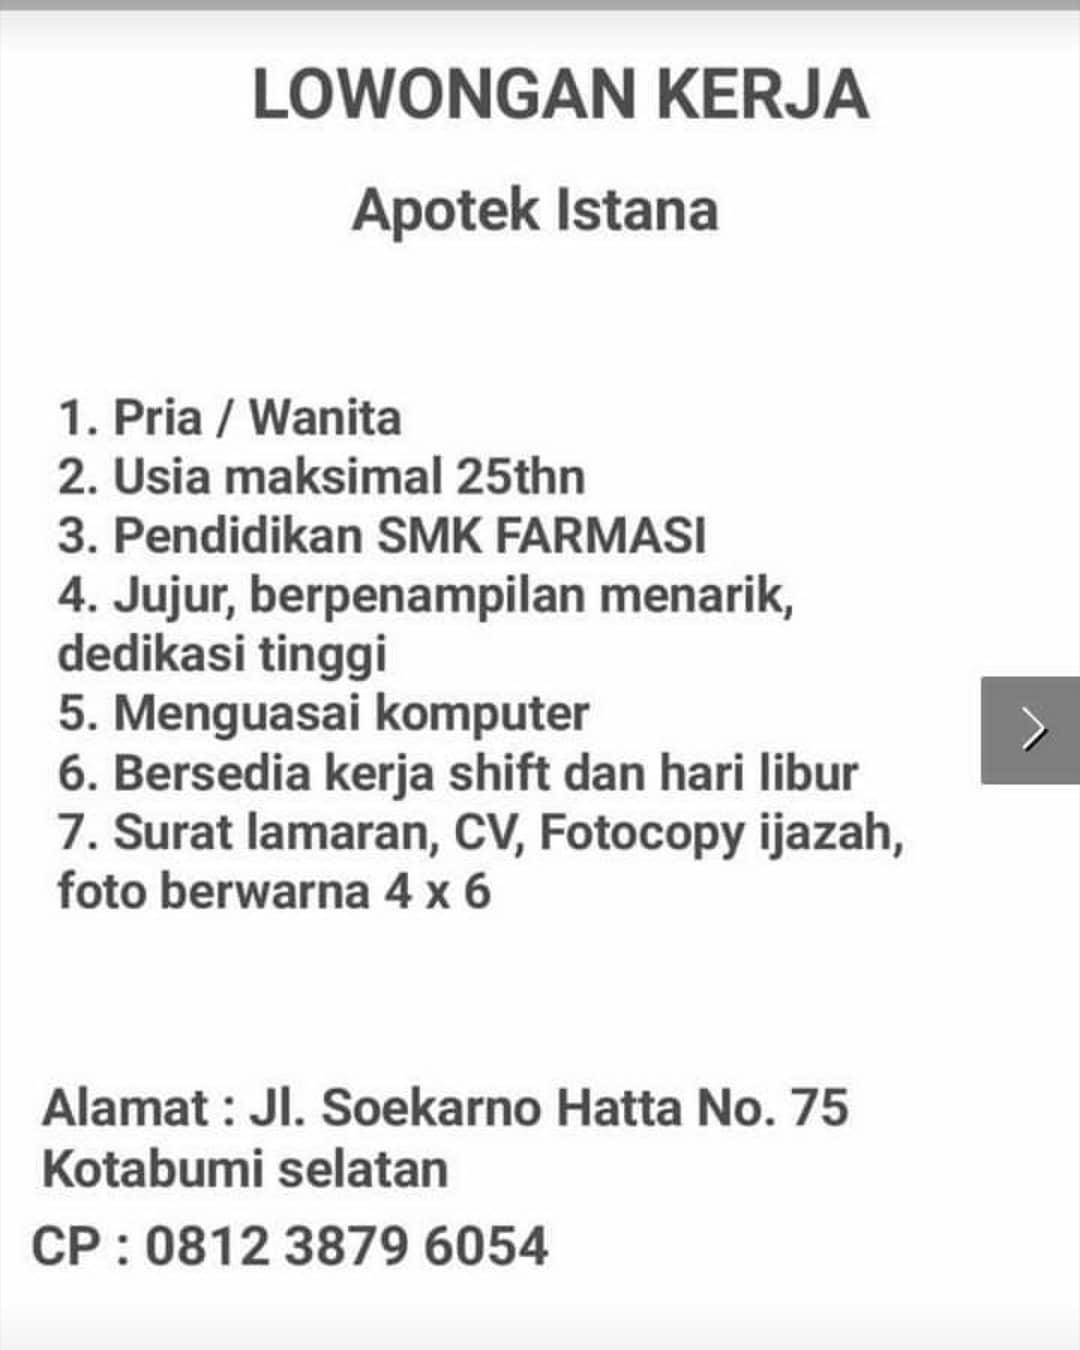 Lowongan Kerja Apotek Istana Kotabumi Selatan Karir Bandar Lampung